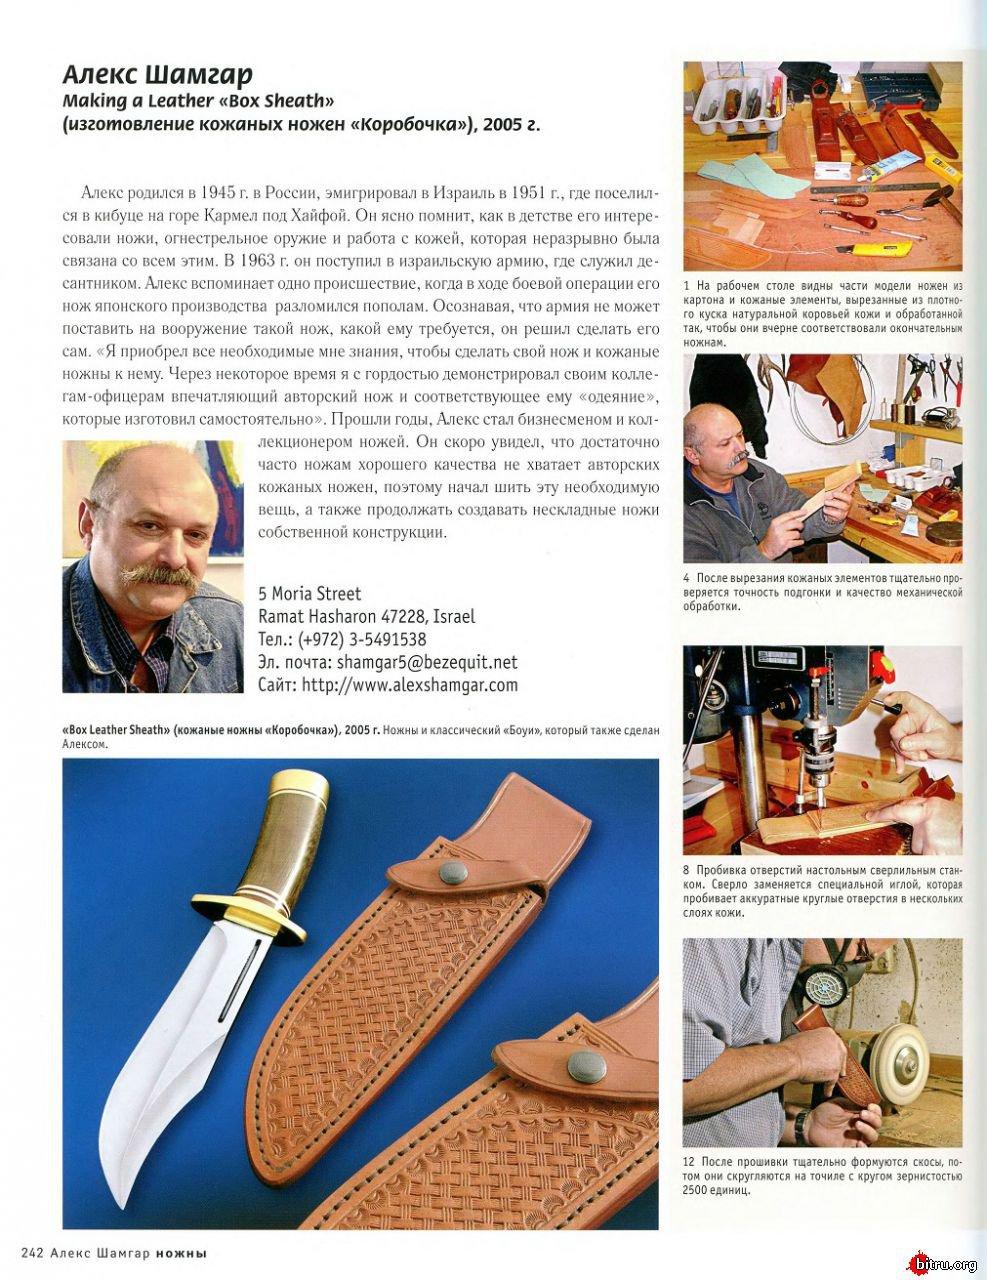 Страница 5 - hunt72.ru | КЛУБ ОХОТНИКОВ СИБИРИ (ТЮМЕНЬ, ХМАО-Югра, ЯНАО)